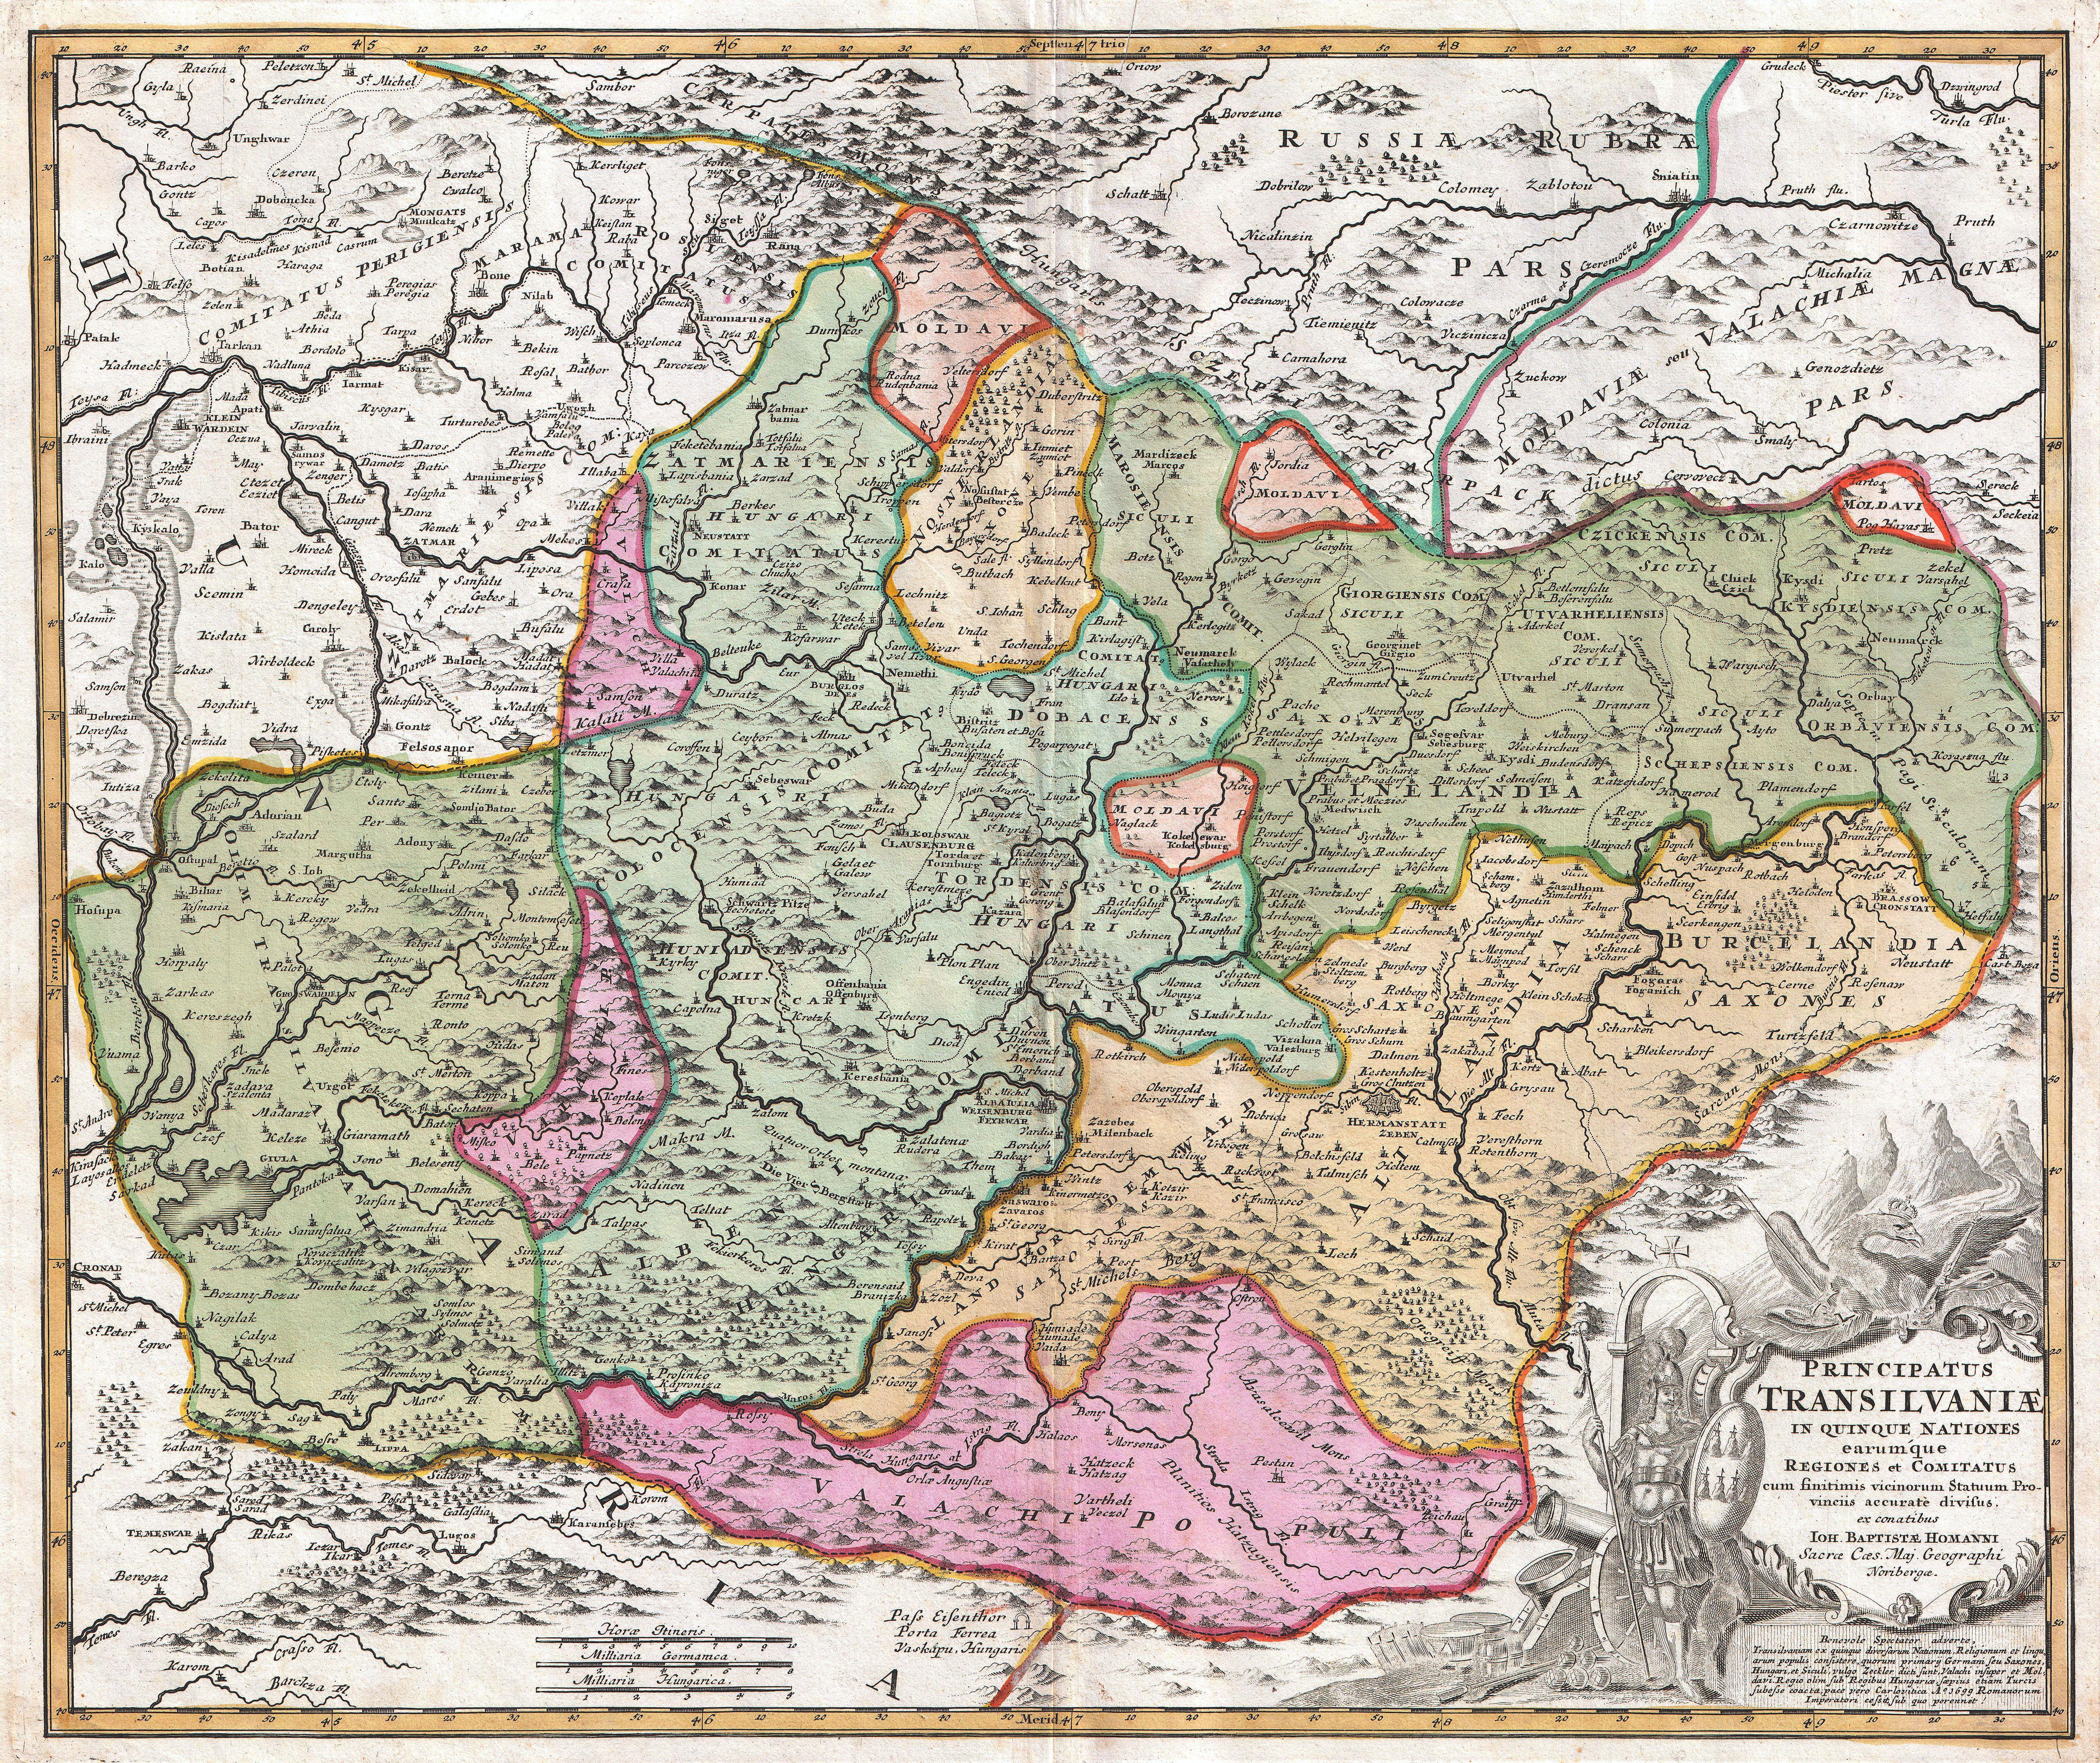 Map Of Transylvania File:1720 Homann Map of Transylvania ( Romania )   Geographicus  Map Of Transylvania